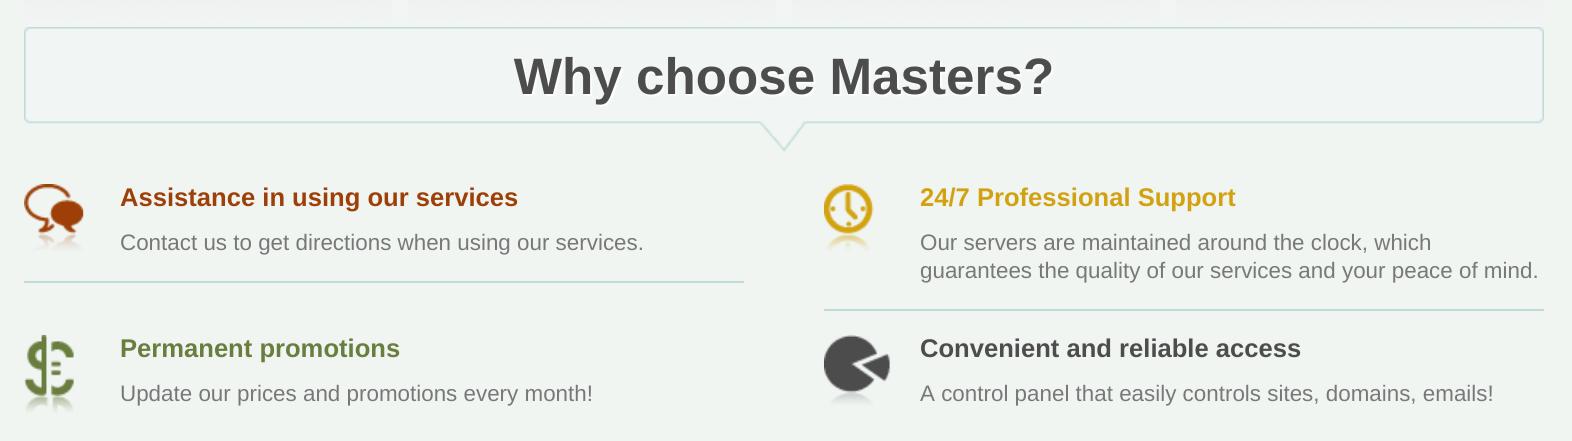 Masters.bg